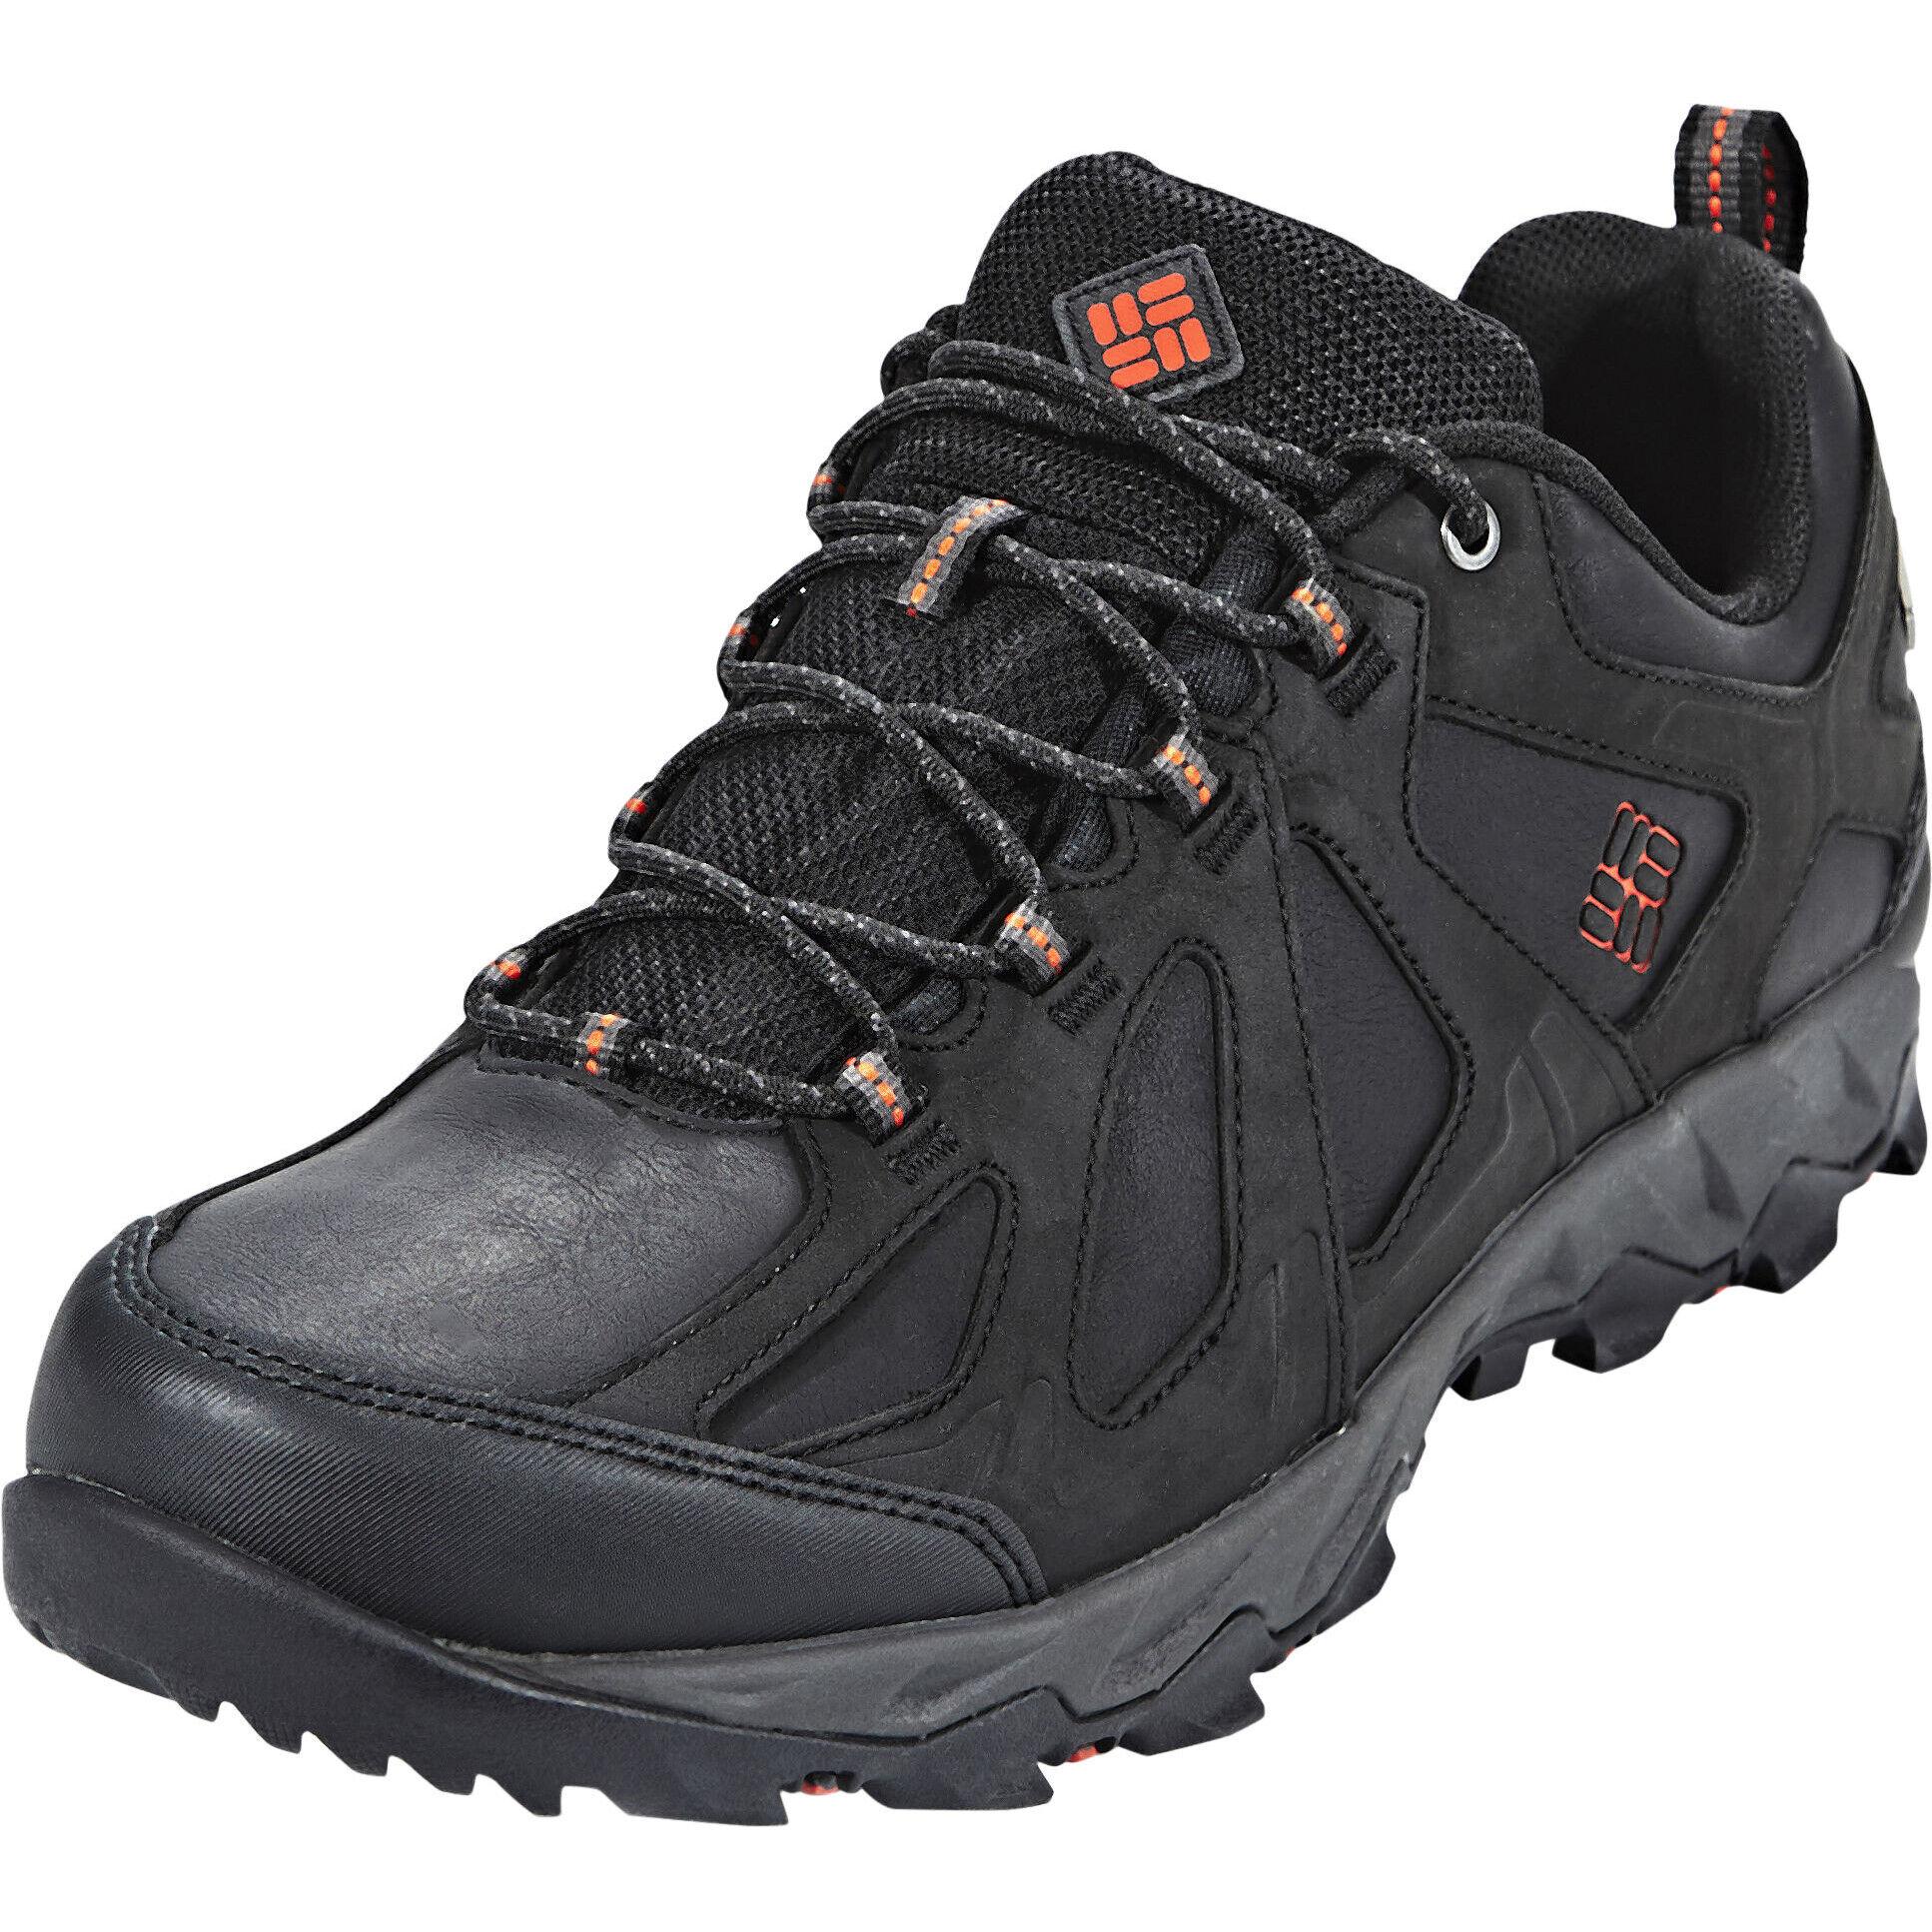 Columbia Schuhe günstig |